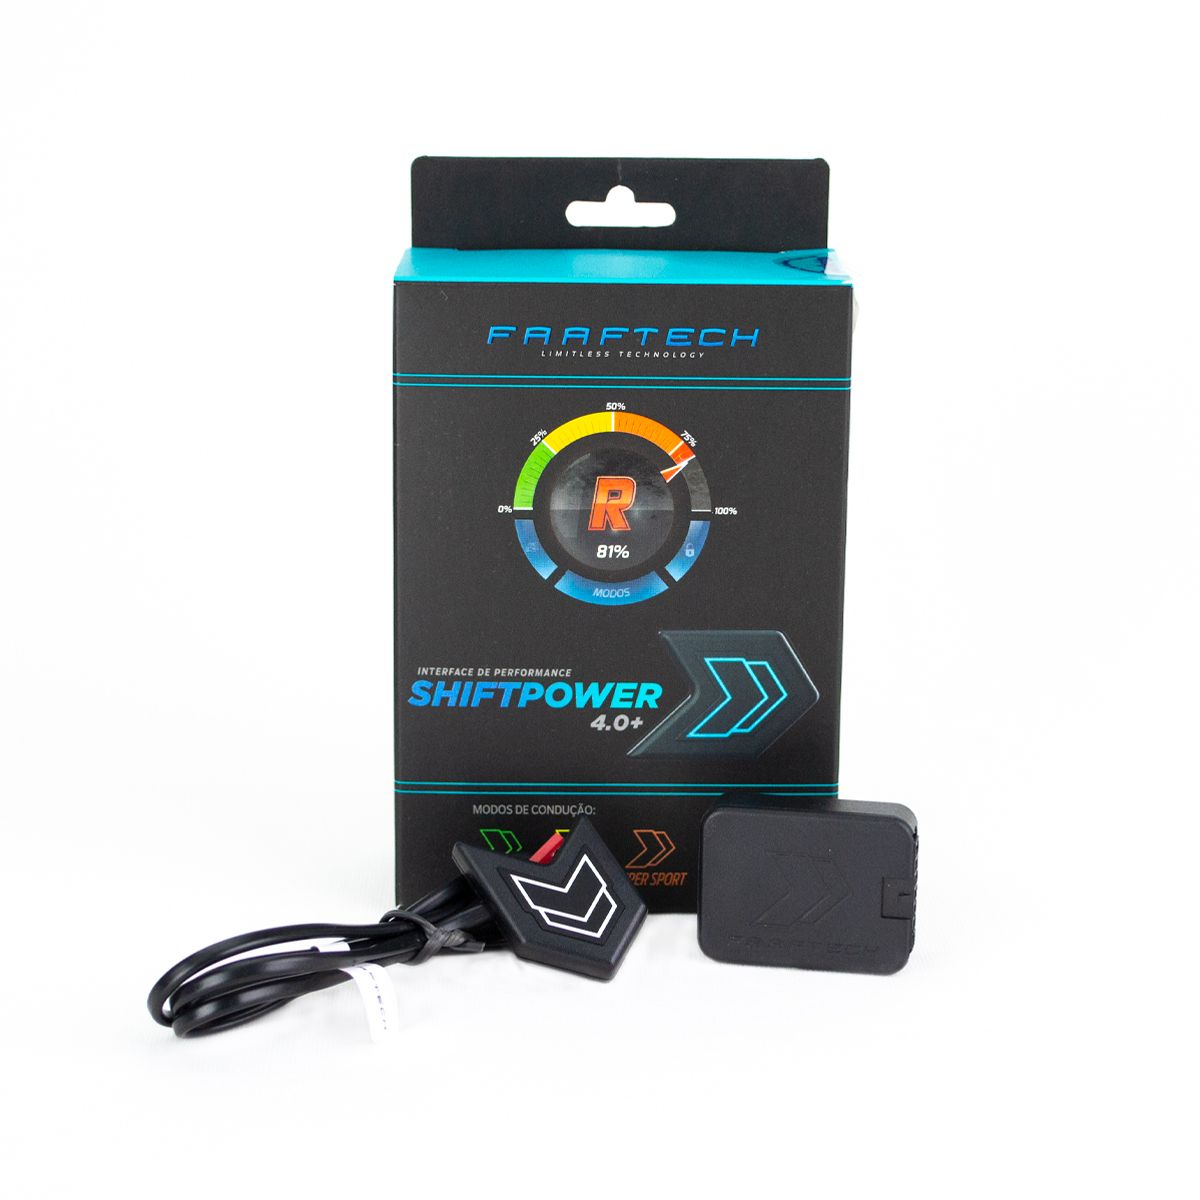 Chip de Pedal Shiftpower Para Chevrolet Tracker